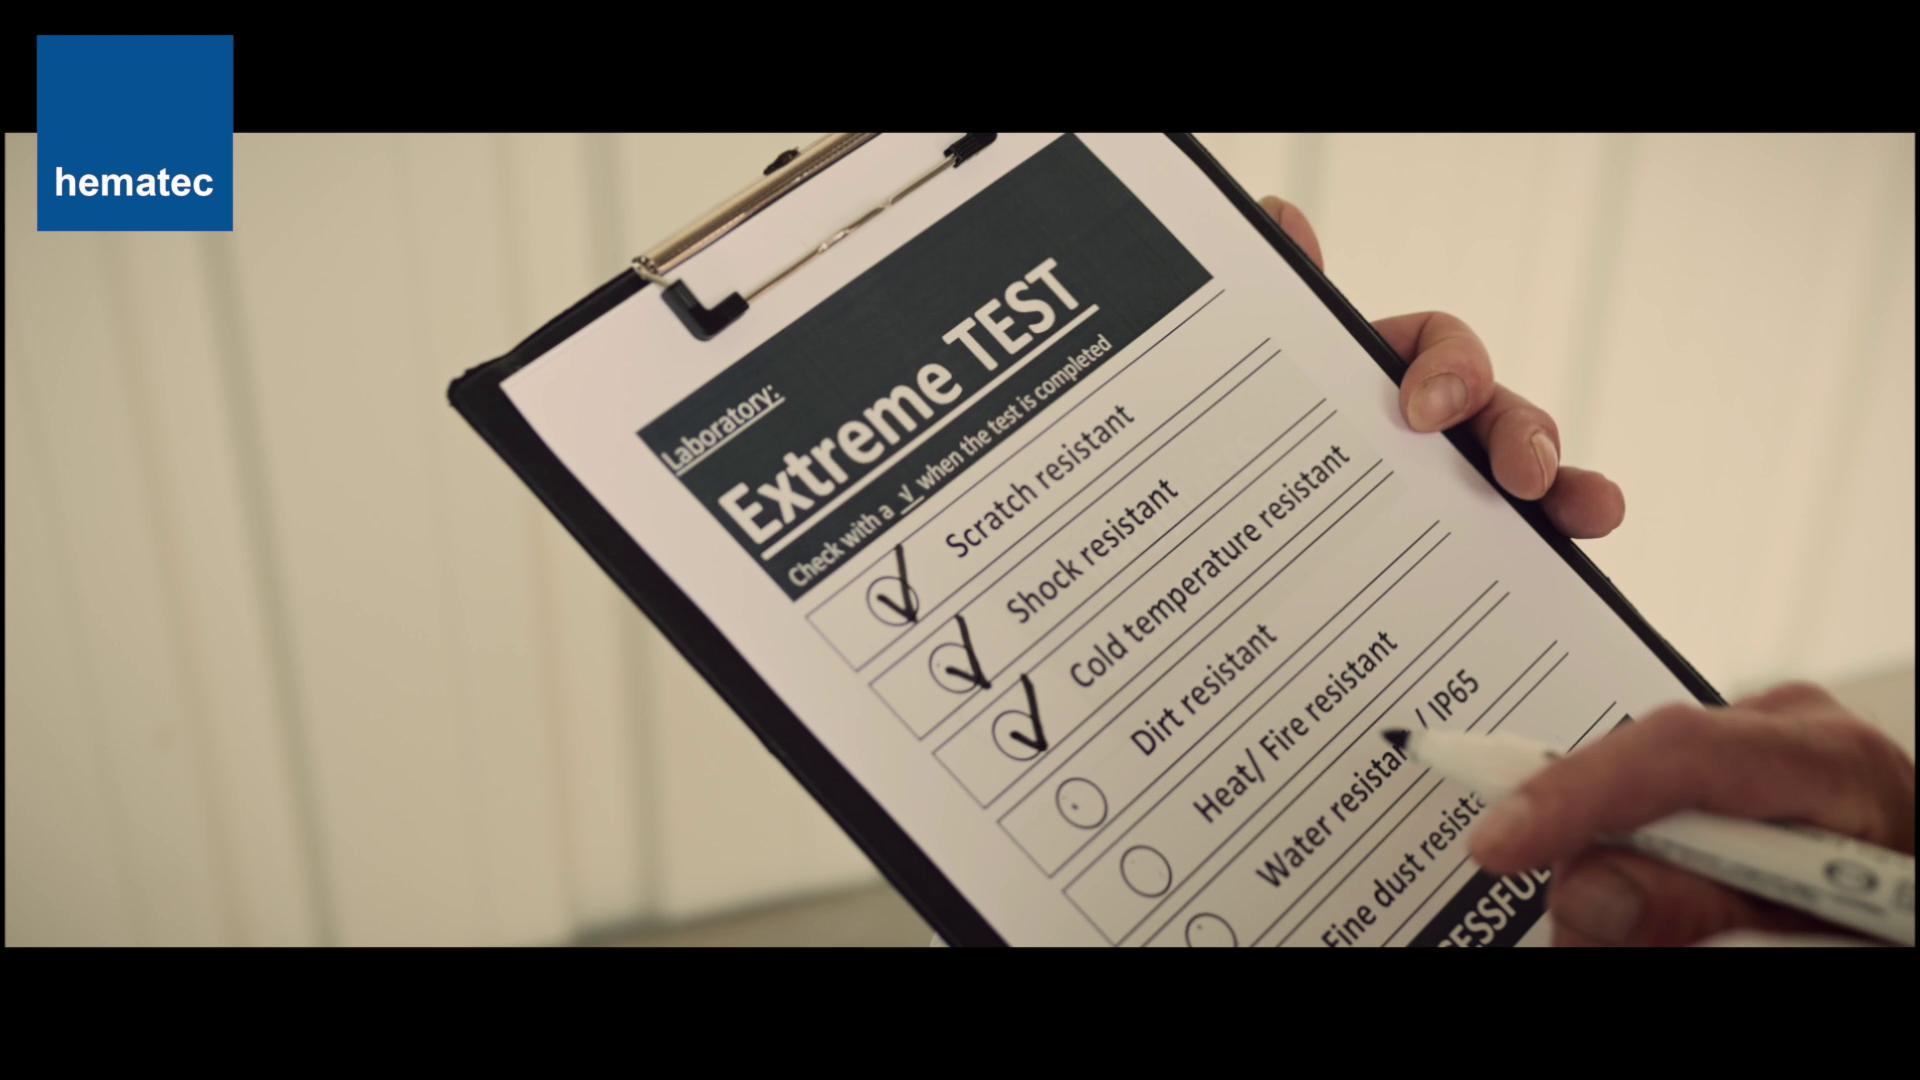 hematec - Extremtest